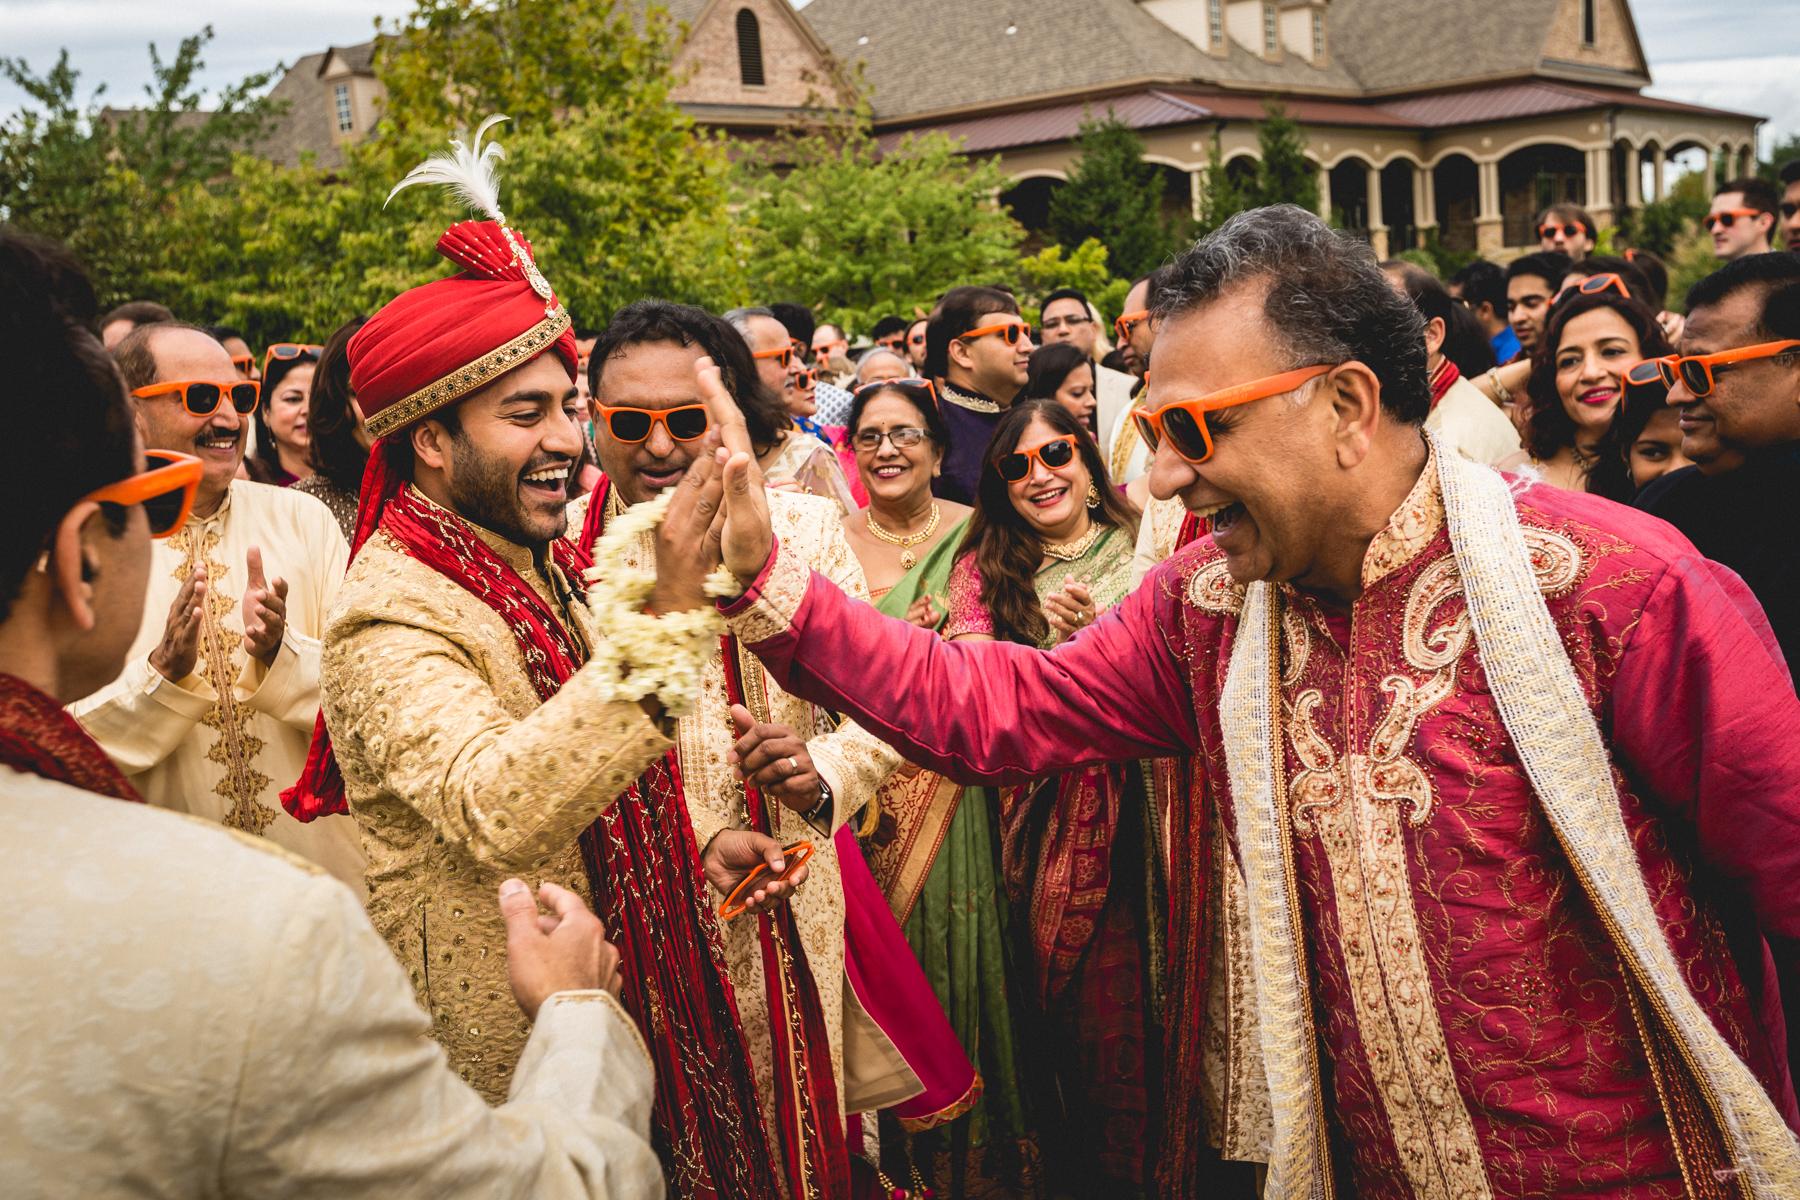 austin-indian-wedding-6.jpg